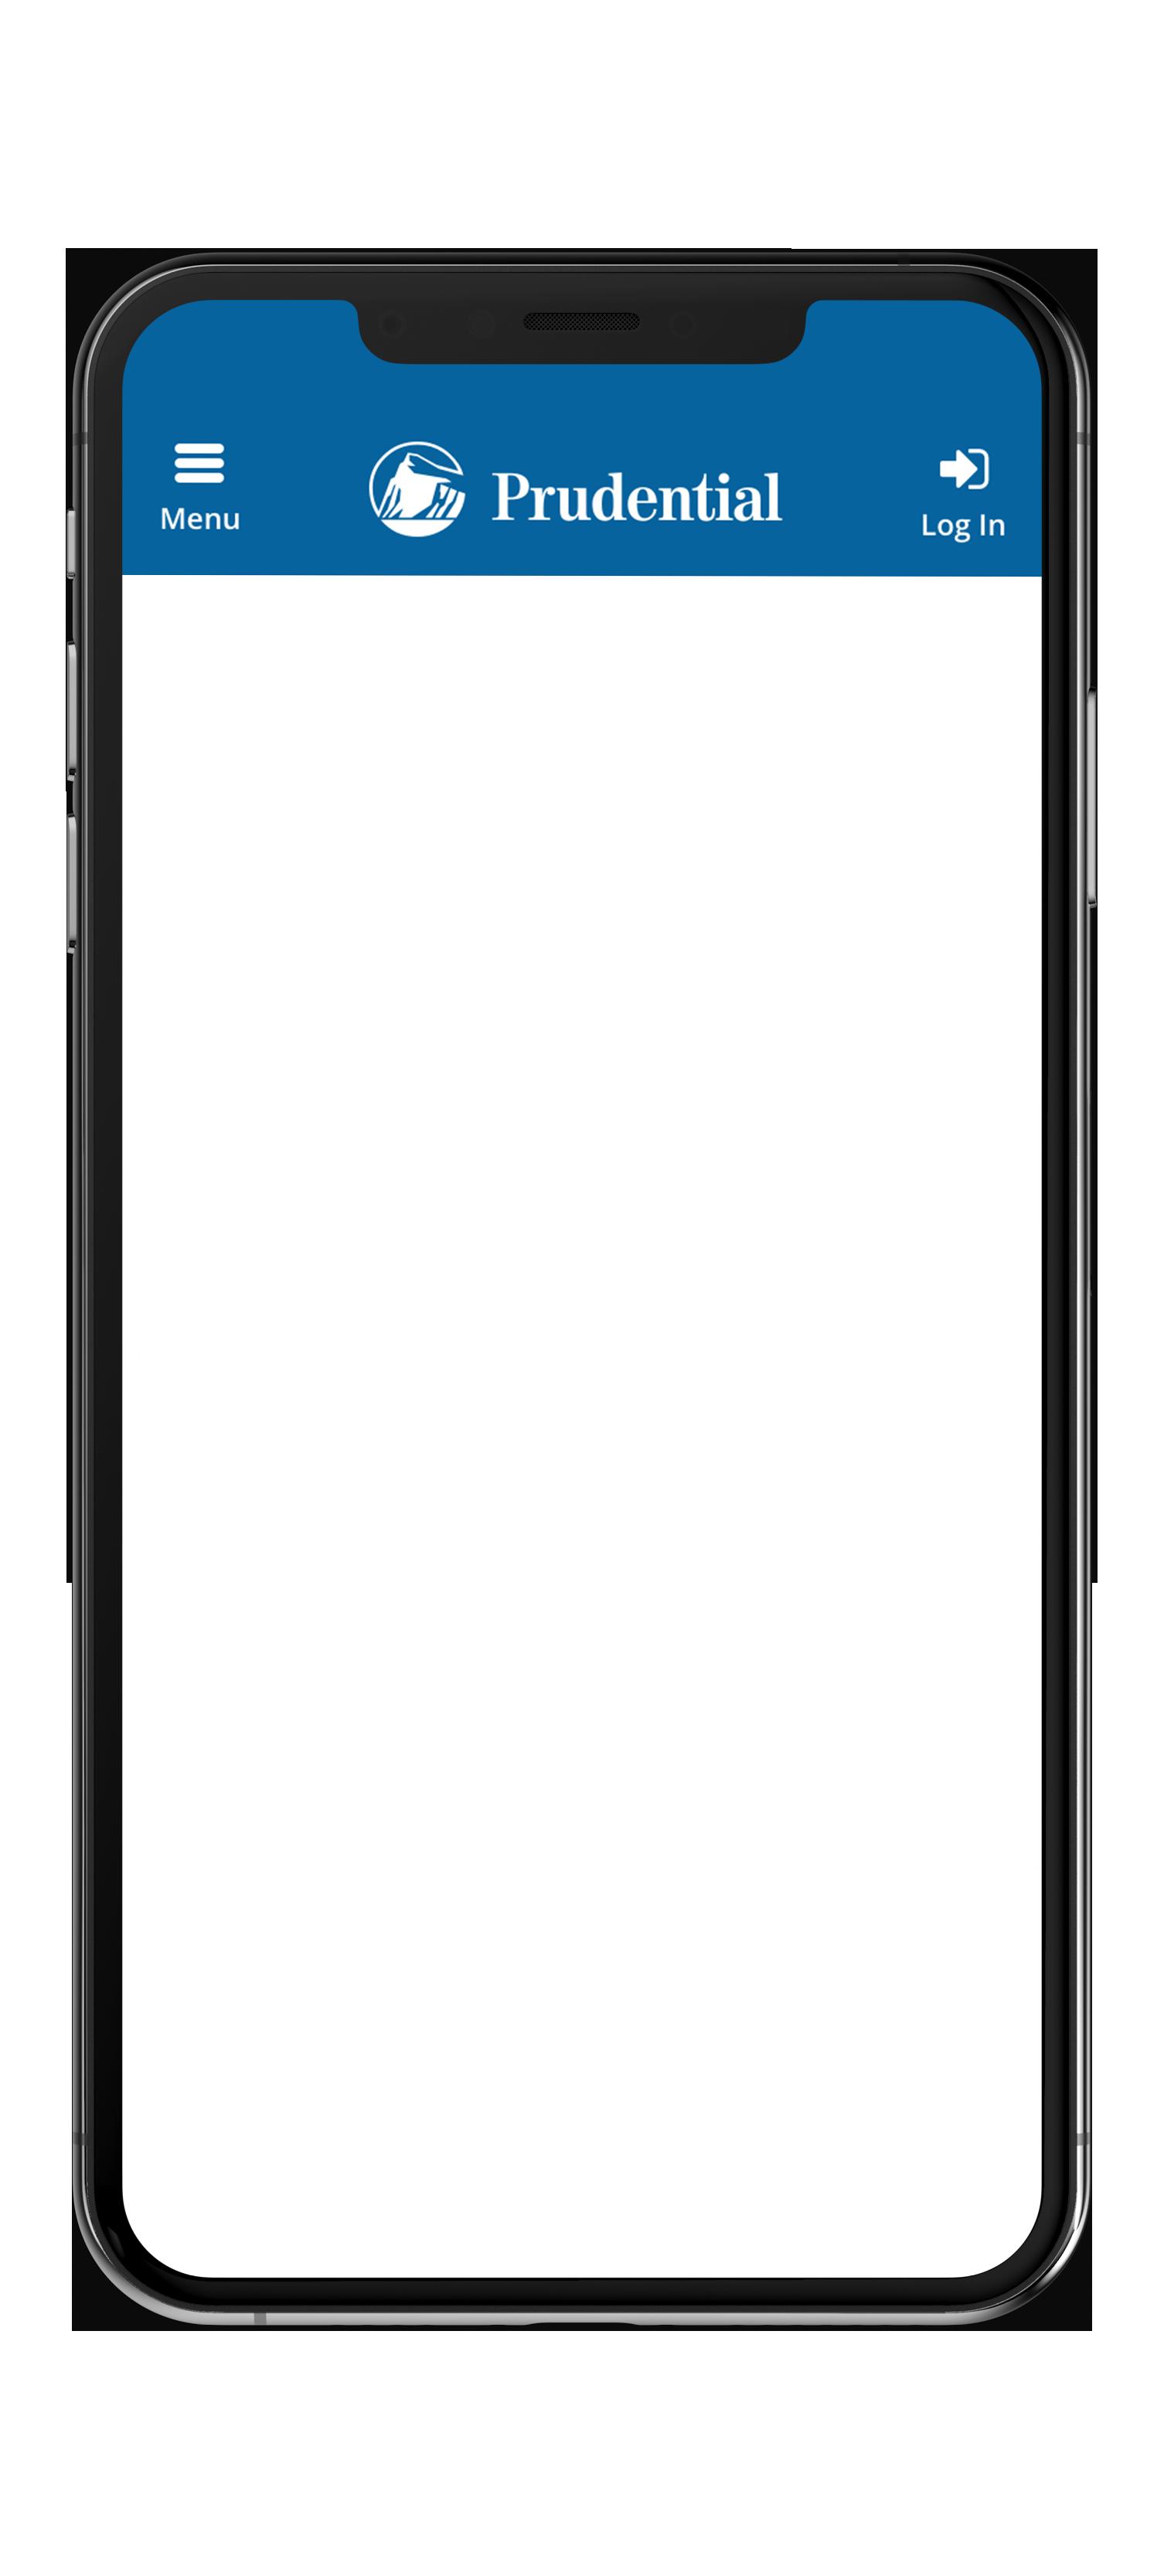 Decorative iphone screen